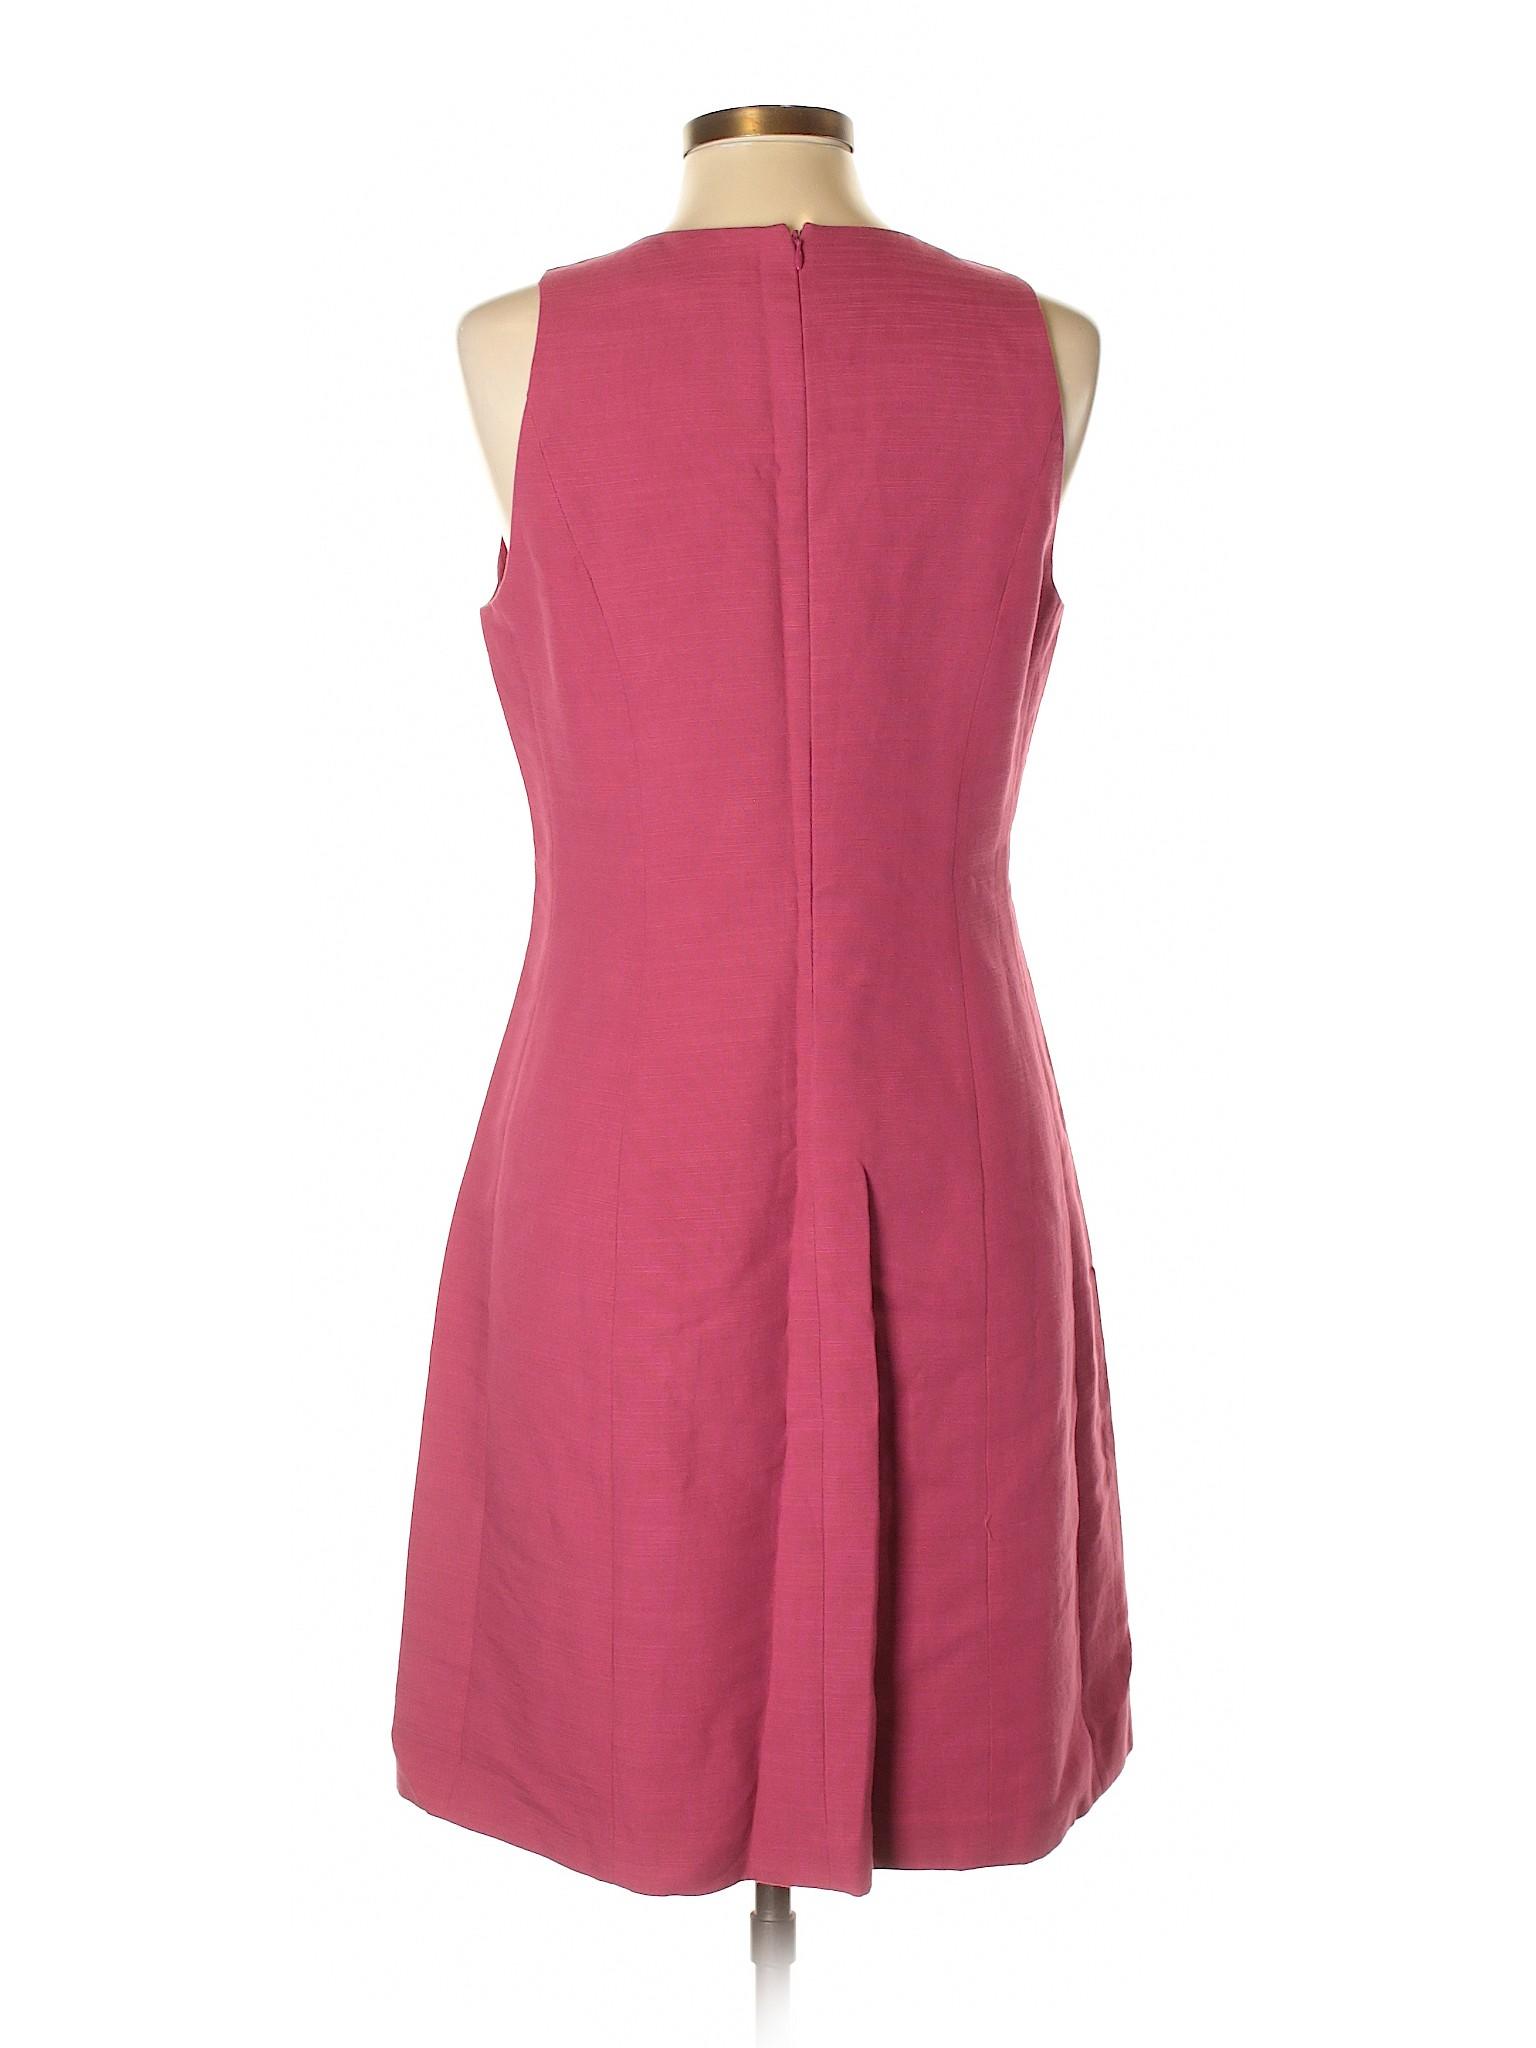 Taylor Casual Dress Selling LOFT Ann xSg1R